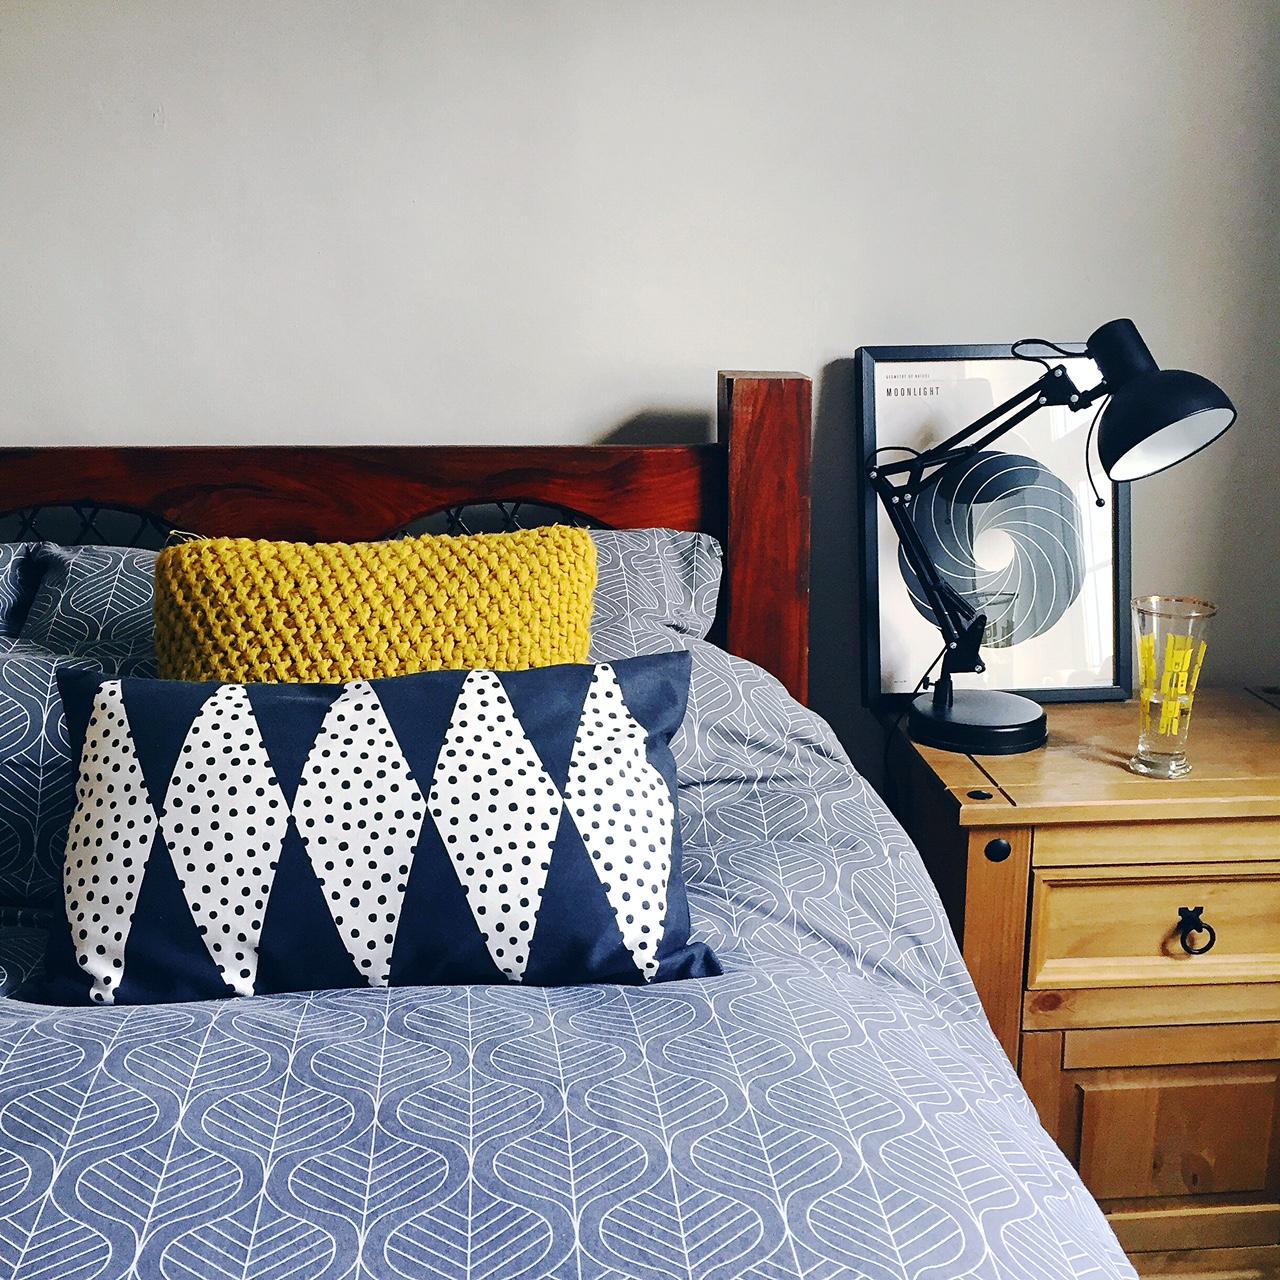 theinkcloset-blog-cheltenham-home-decor-simon-page-cushions.JPG